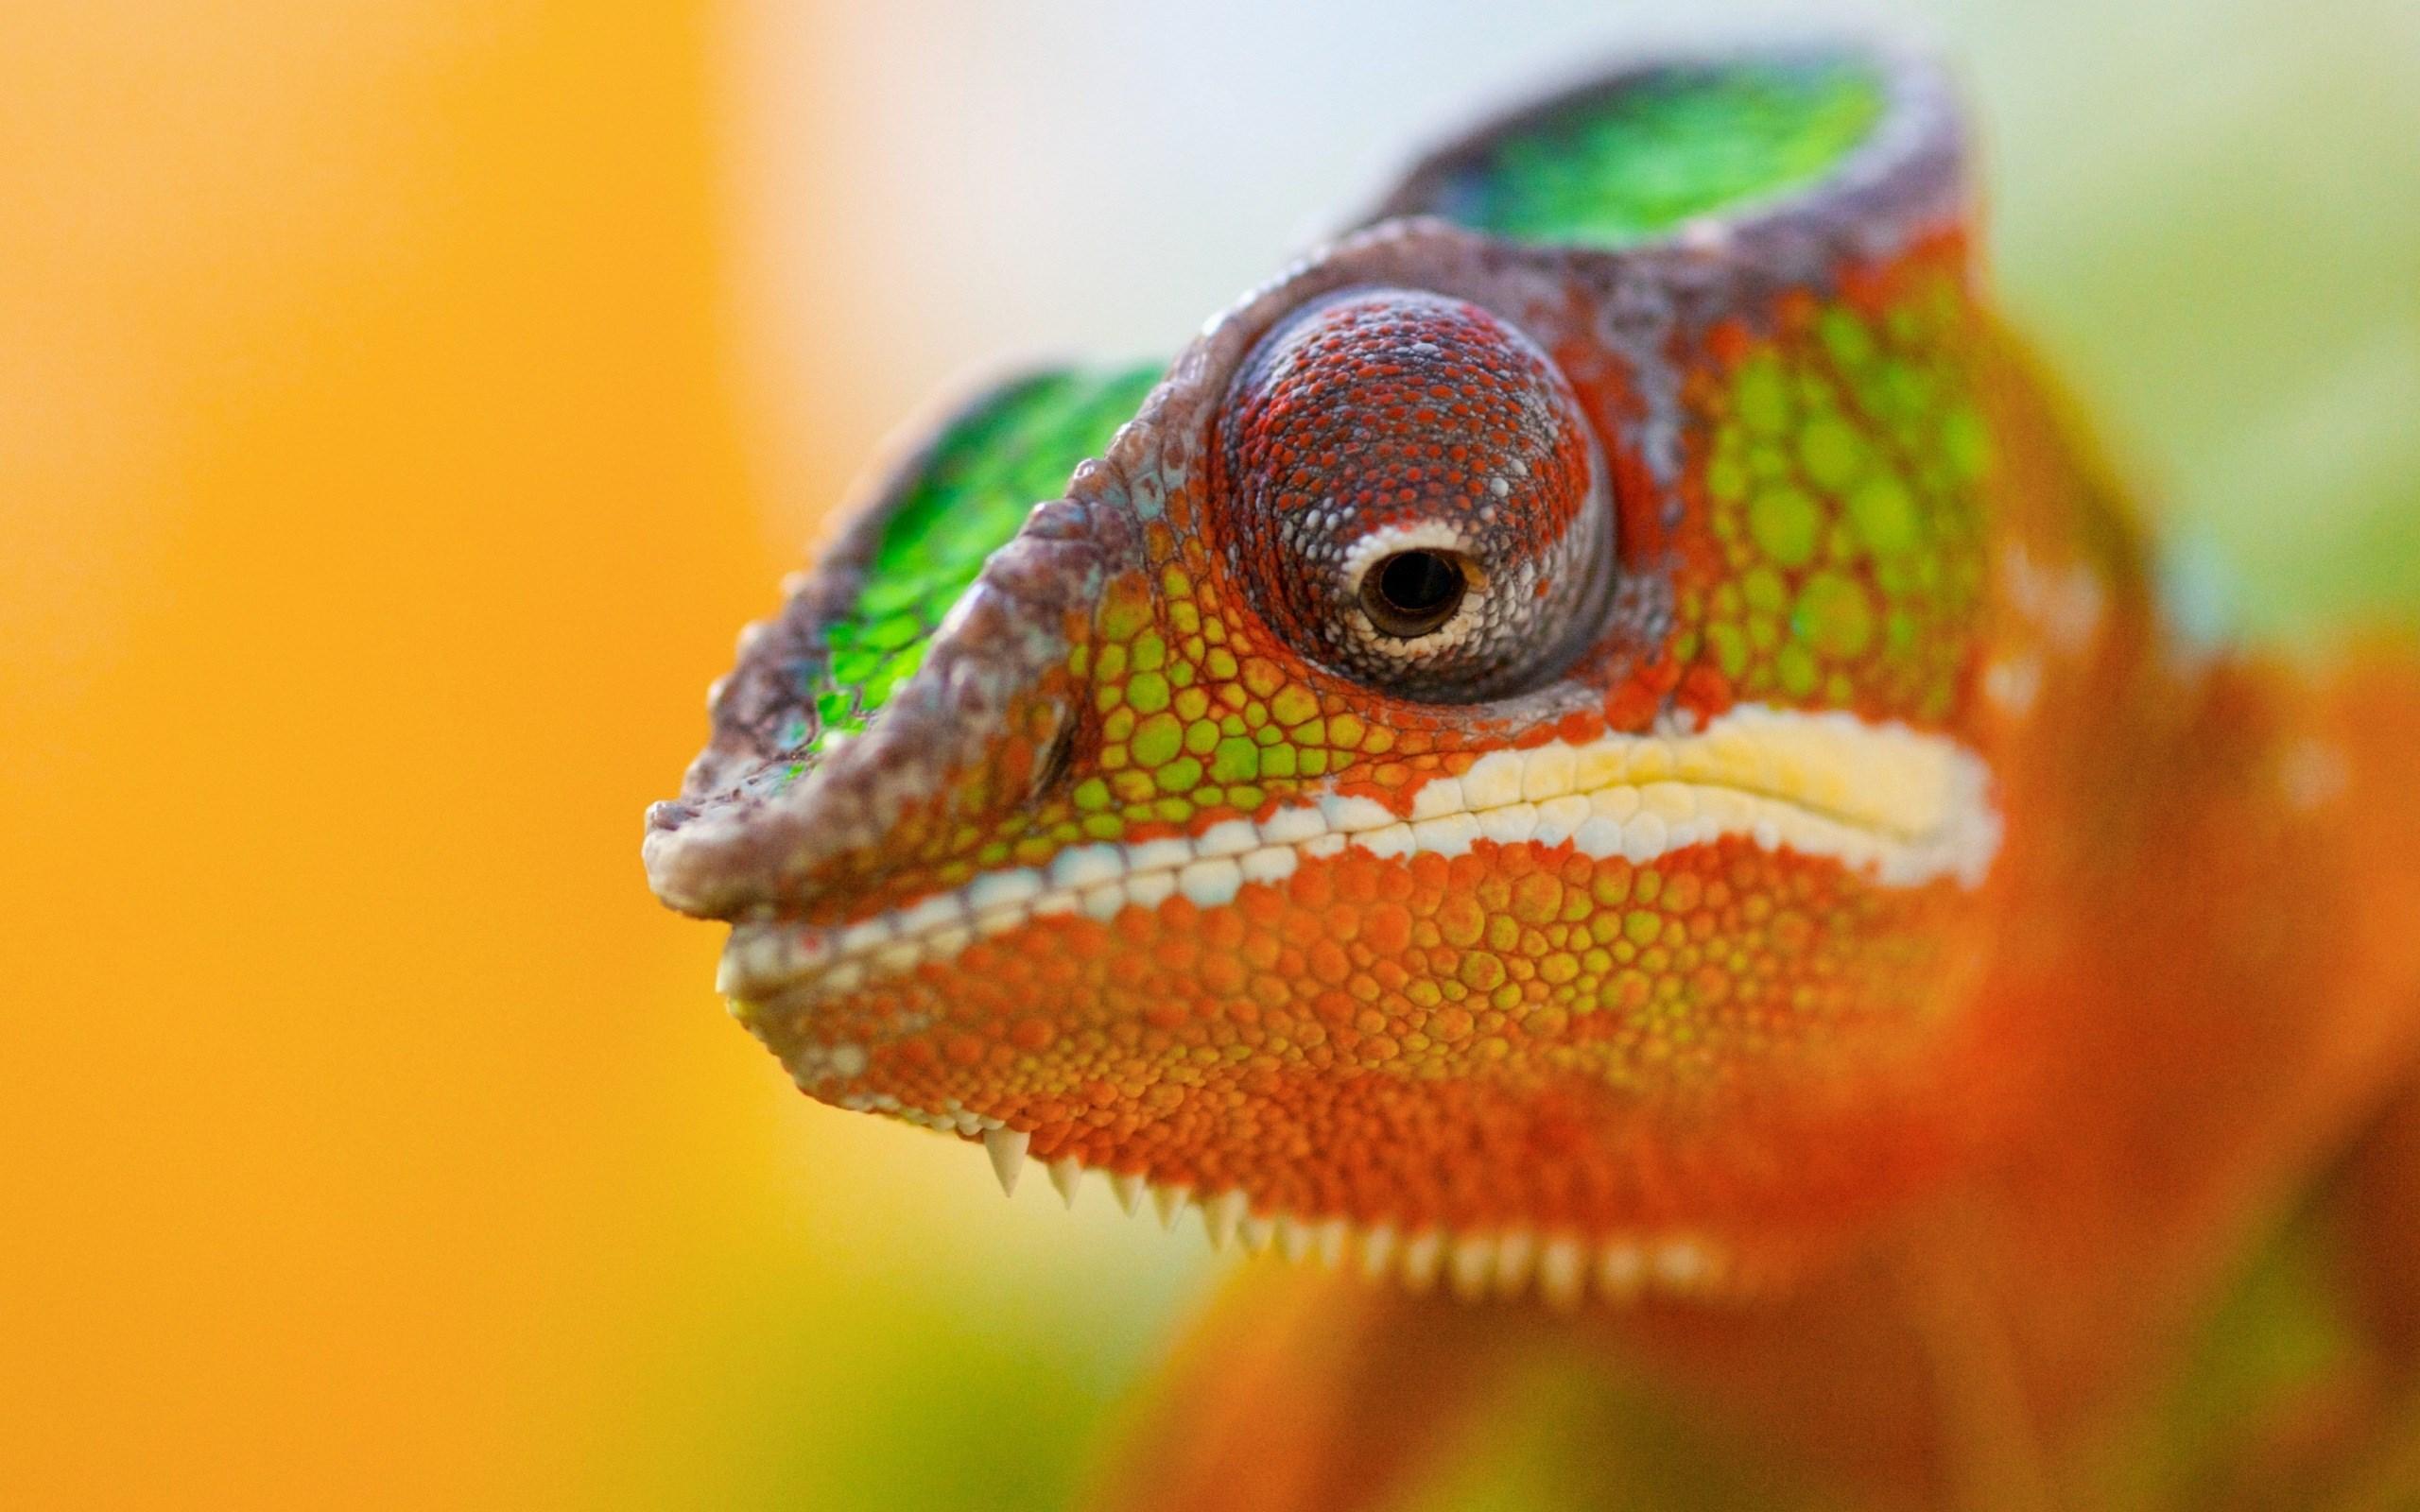 Lizard Close-Up Chameleon